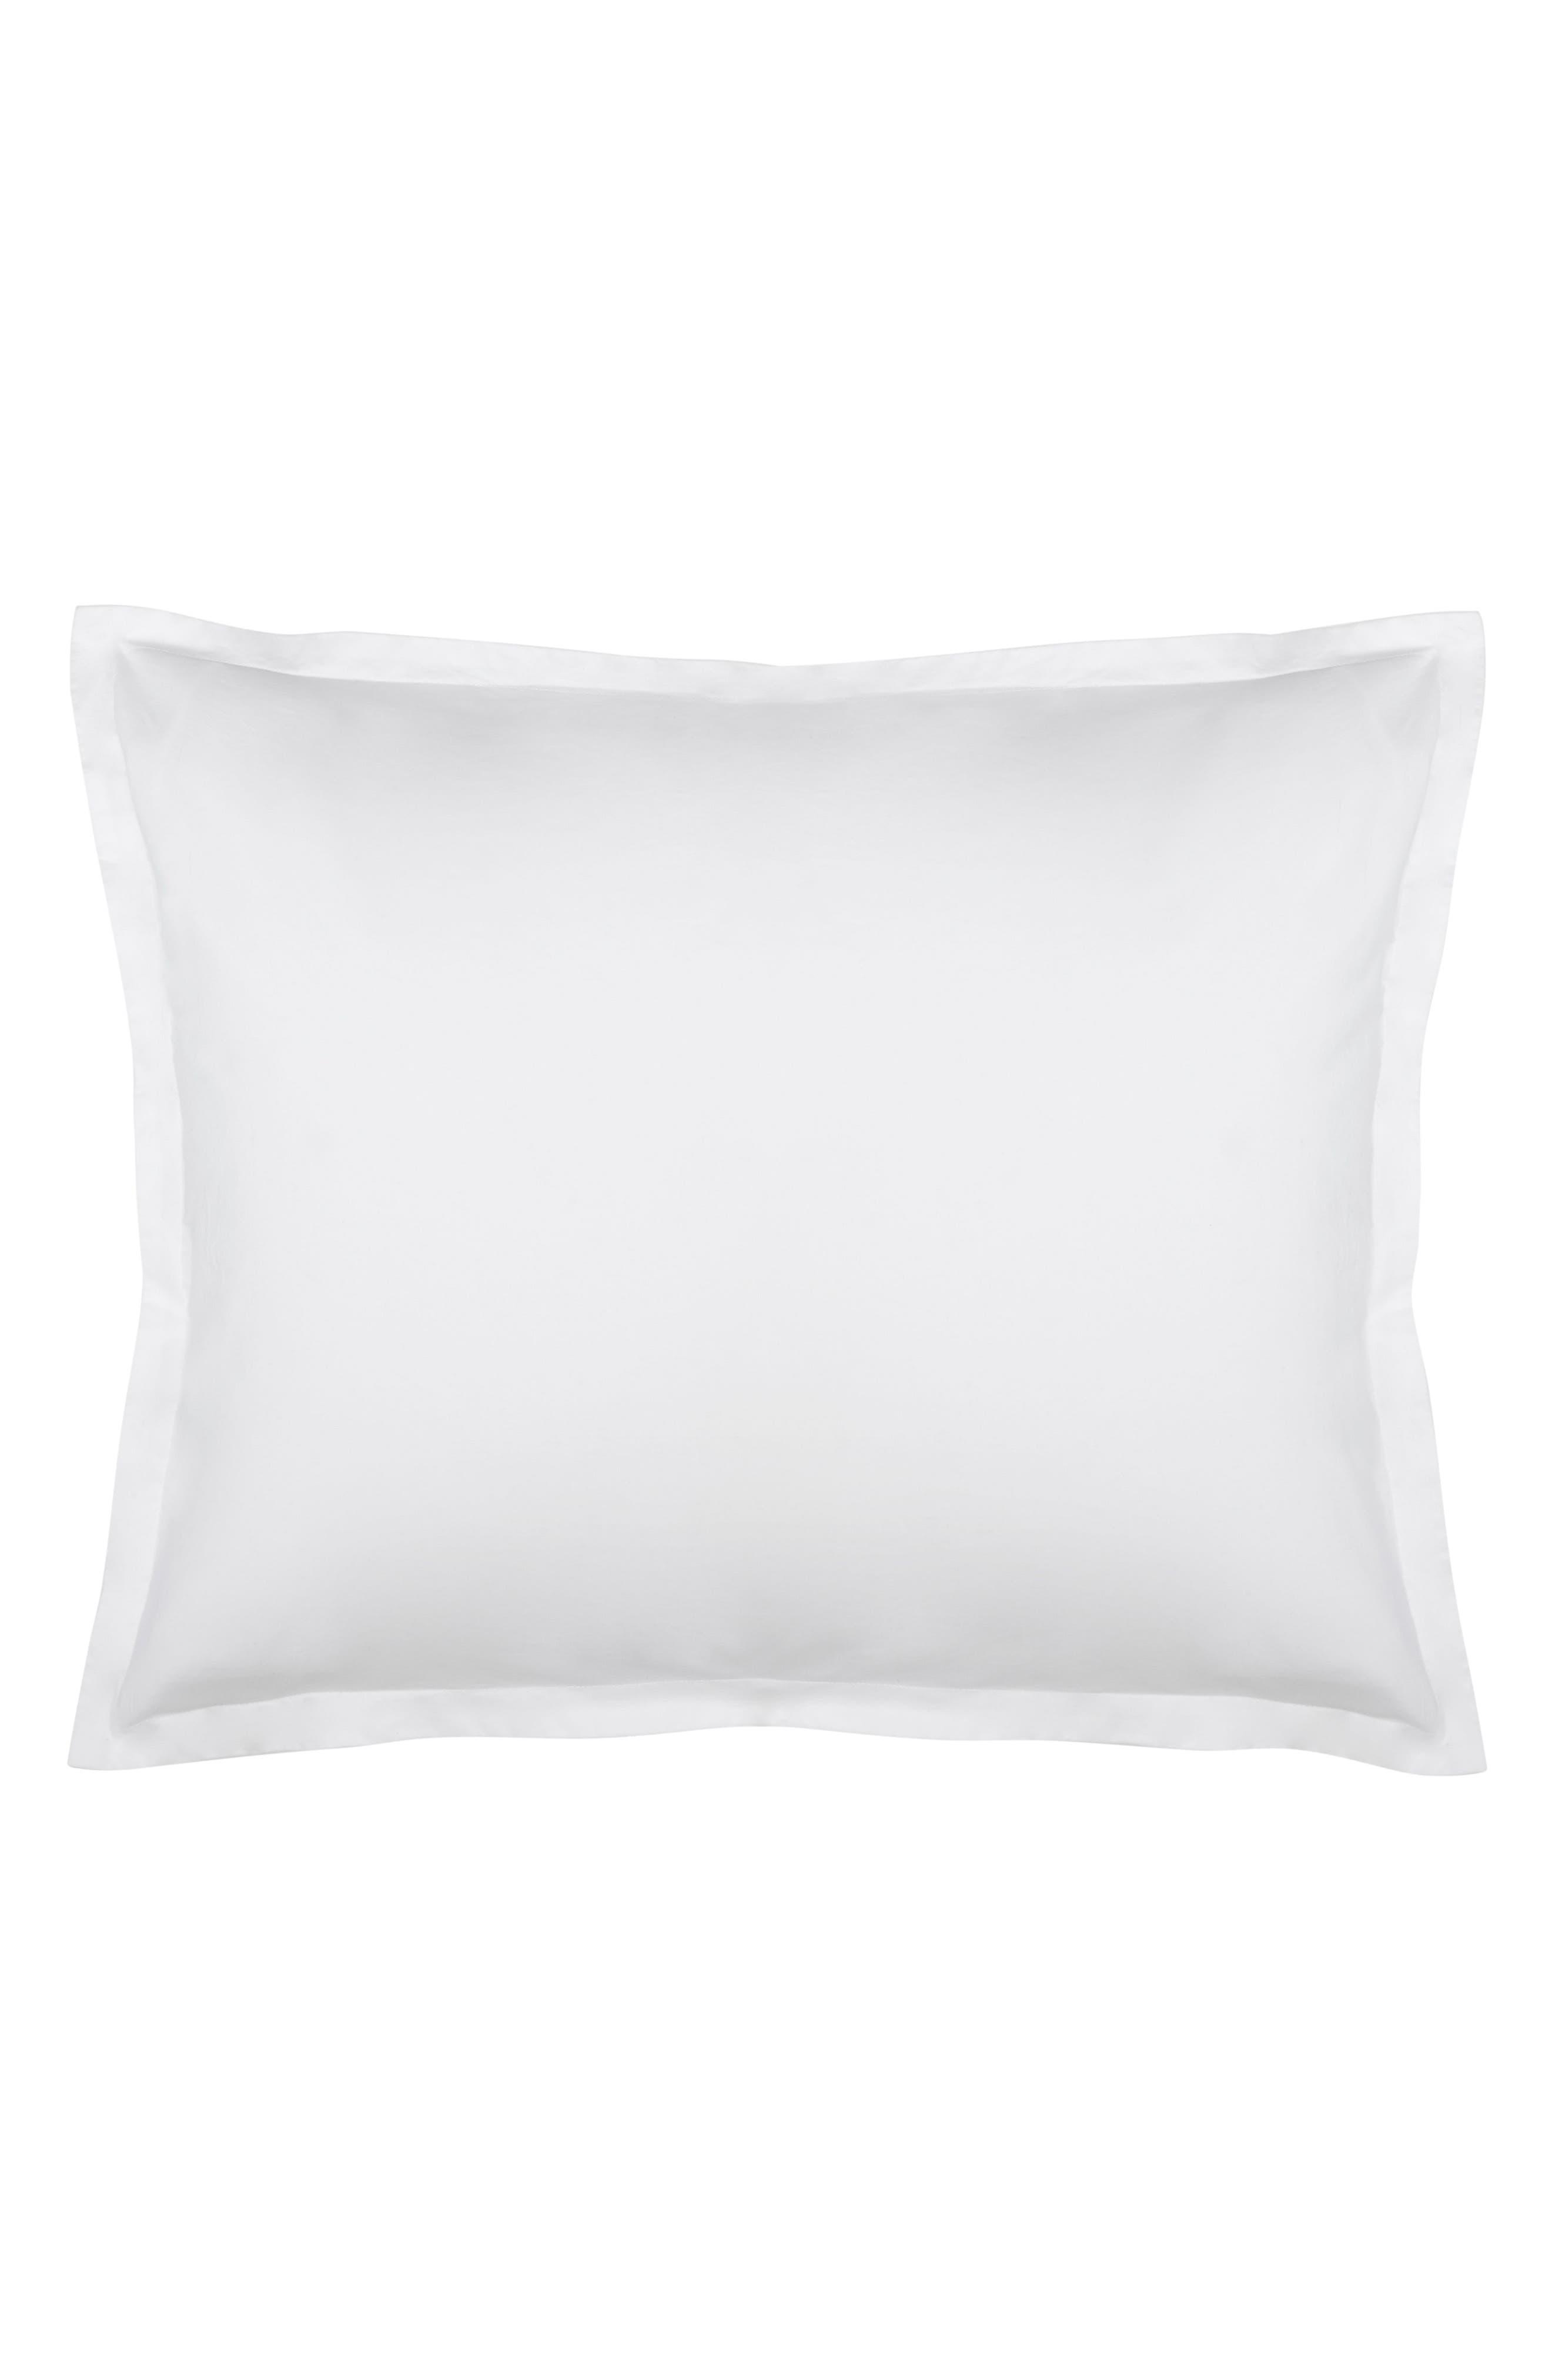 Lorimer 300 Thread Count Pillow Sham,                         Main,                         color, White